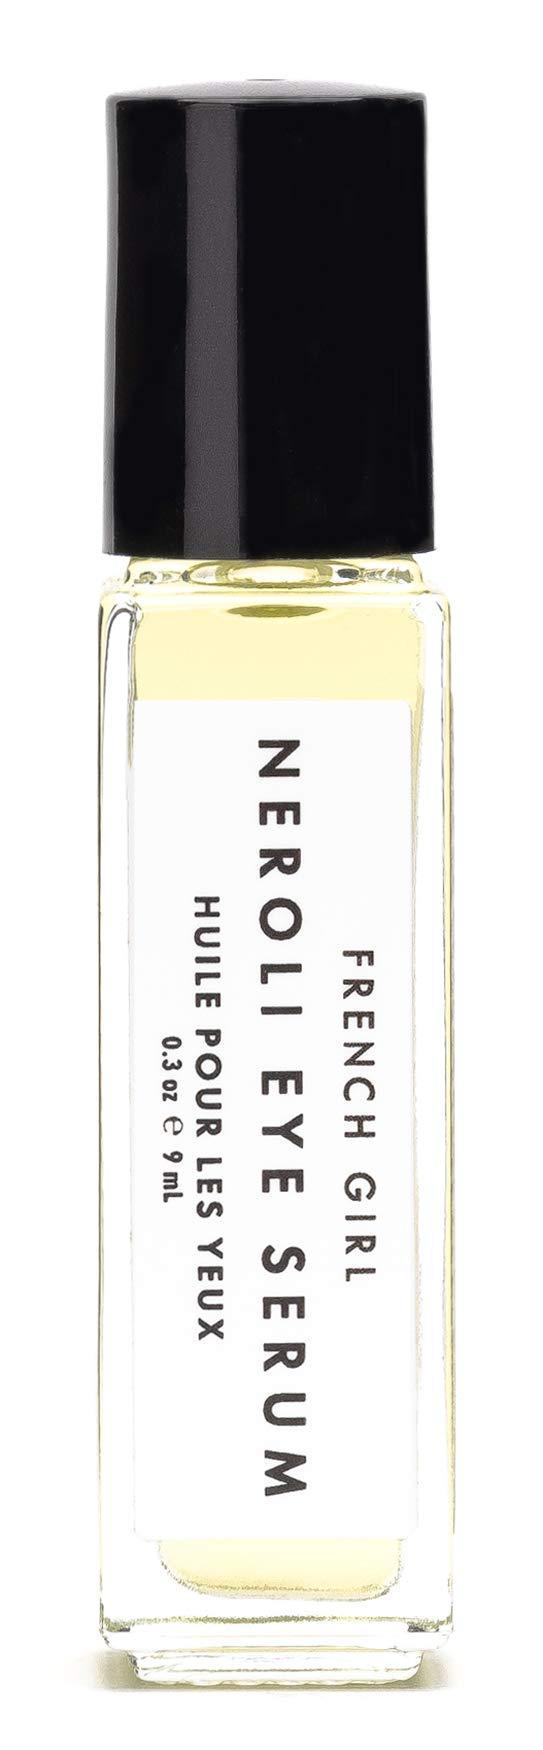 French Girl Organics - Organic/Vegan Neroli Under Eye Elixir (9 ml Roller)